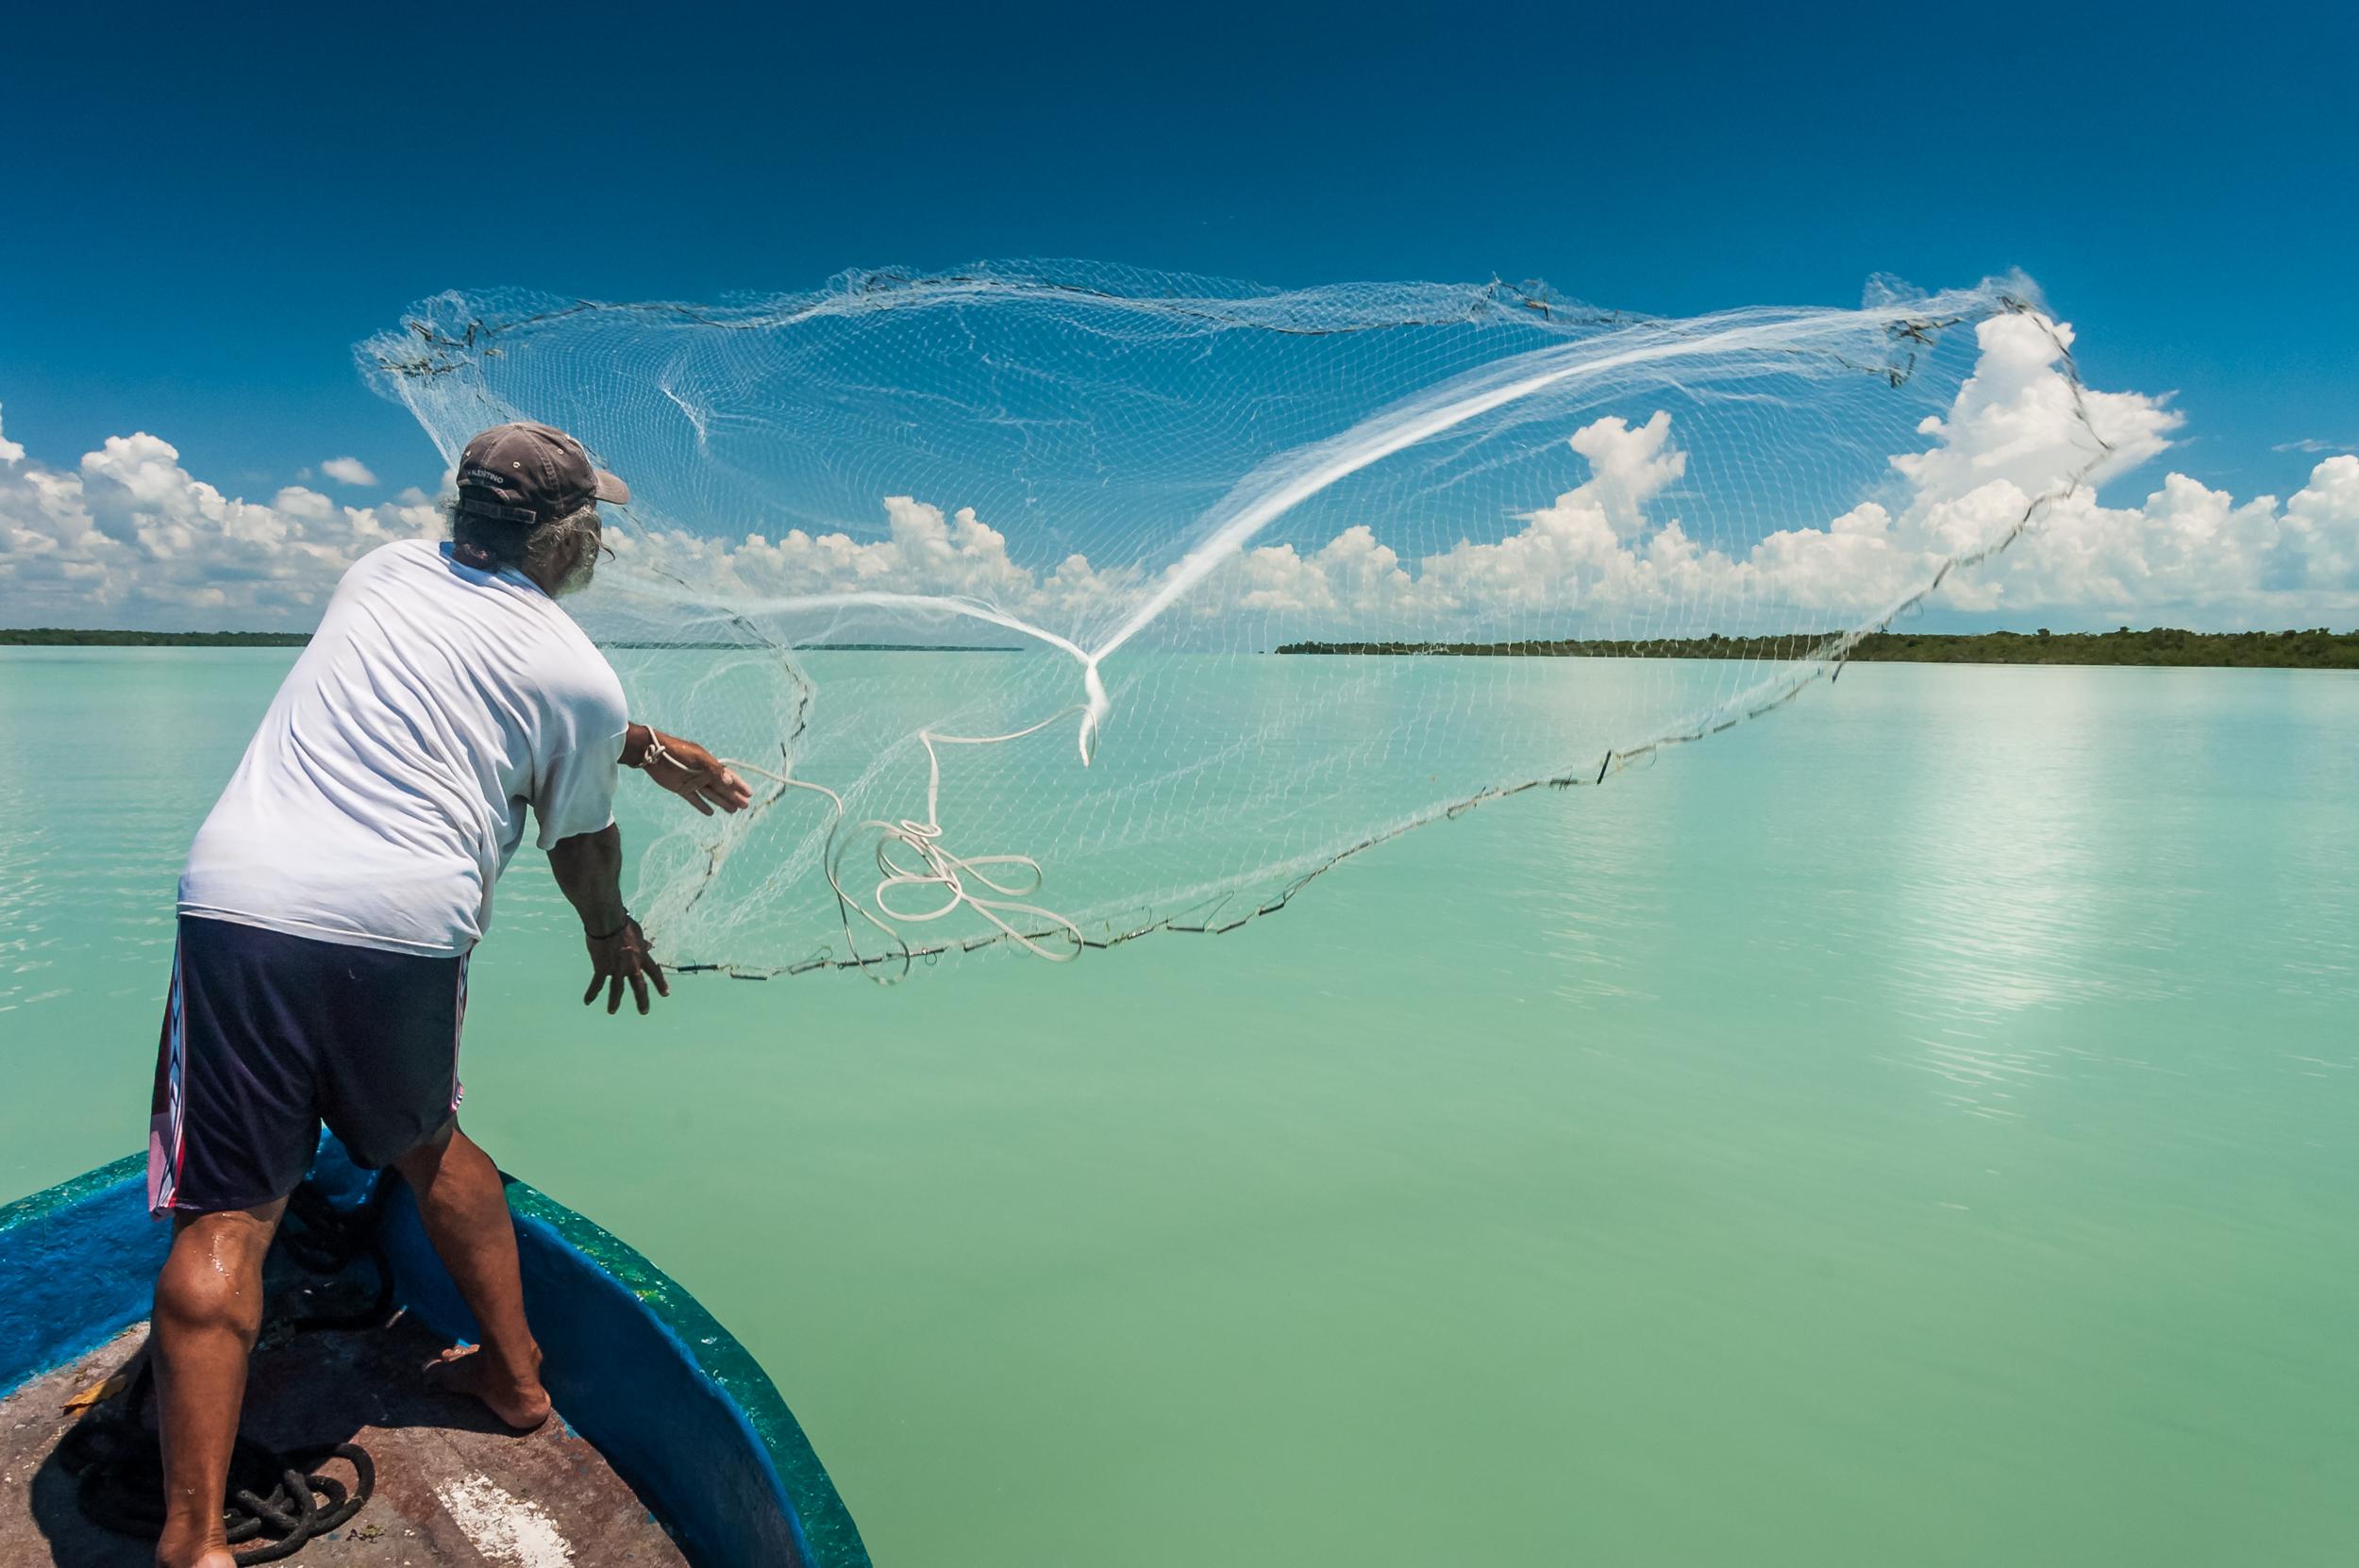 Pescador de Nubes